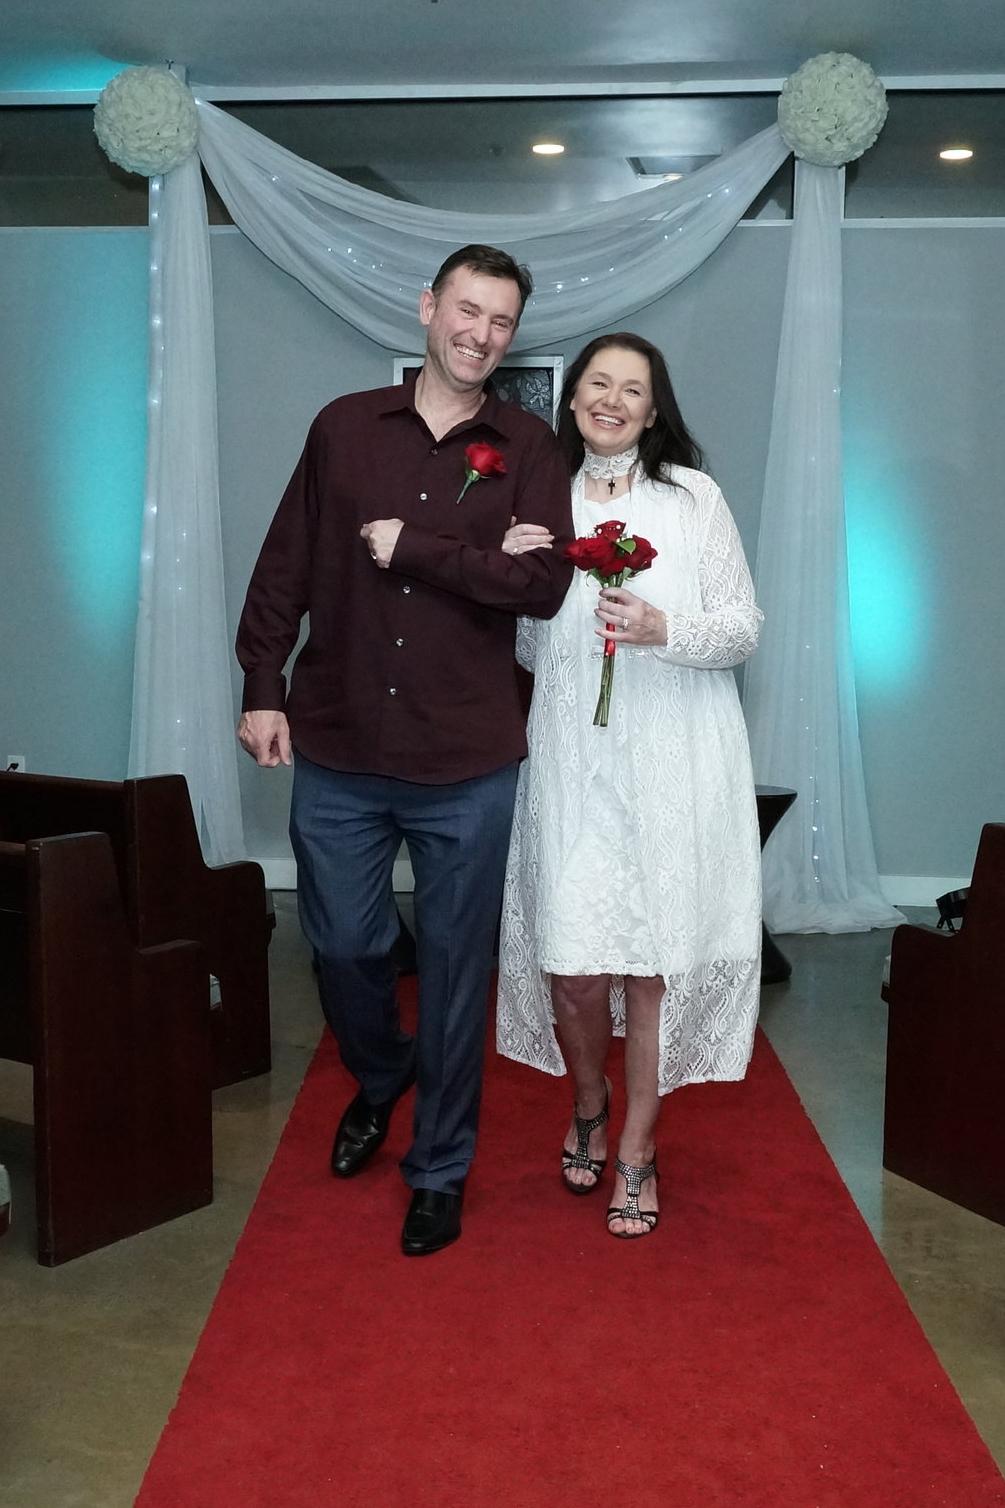 Las Vegas Wedding And Vow Renewal Ceremonies A Wedding Chapel In